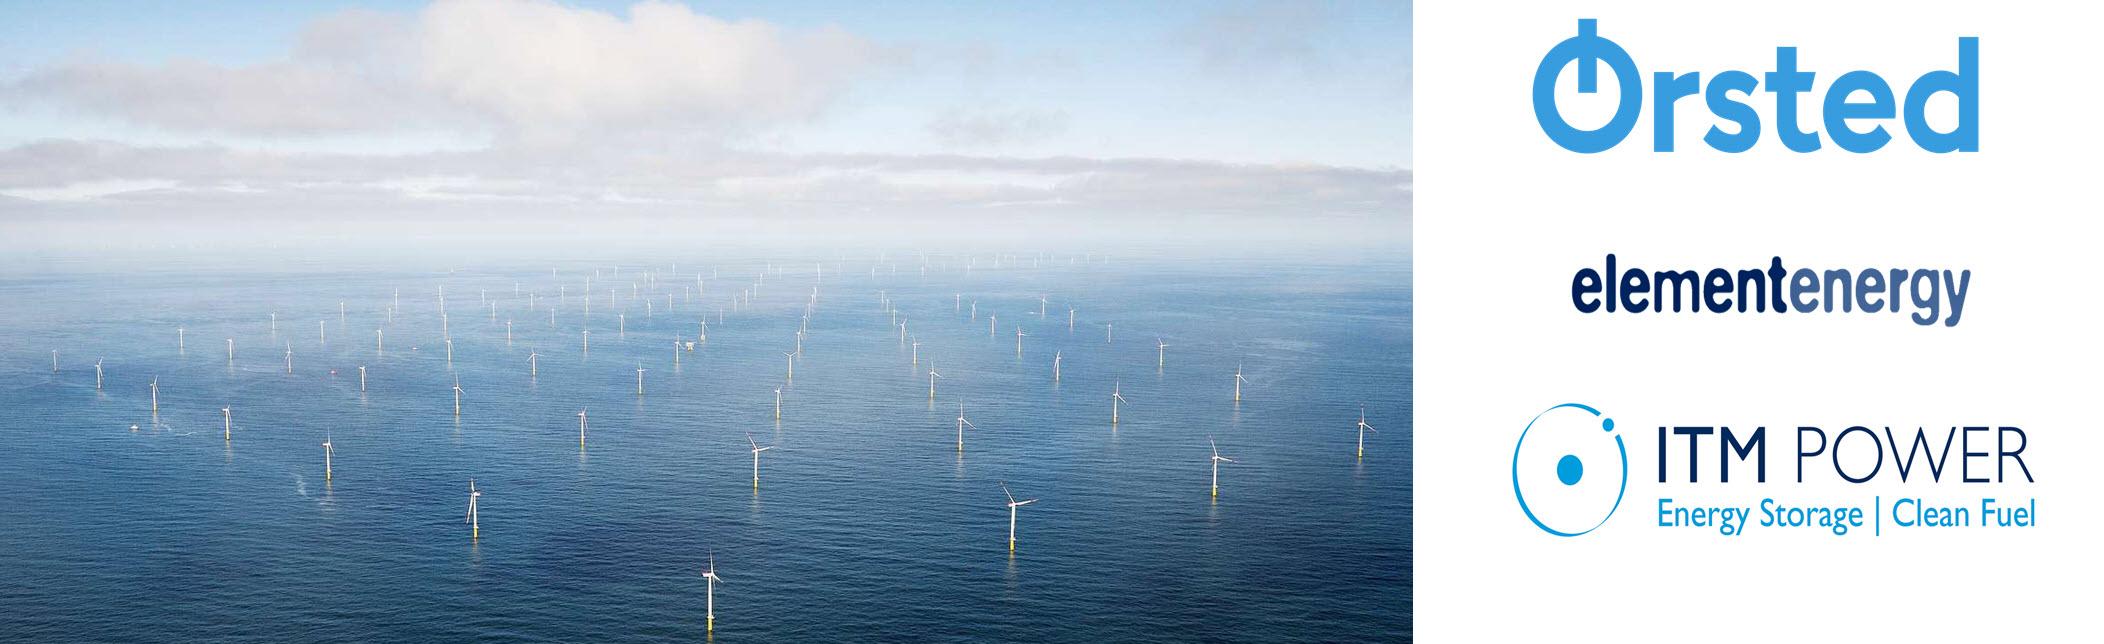 Orsted Wind Farm Main